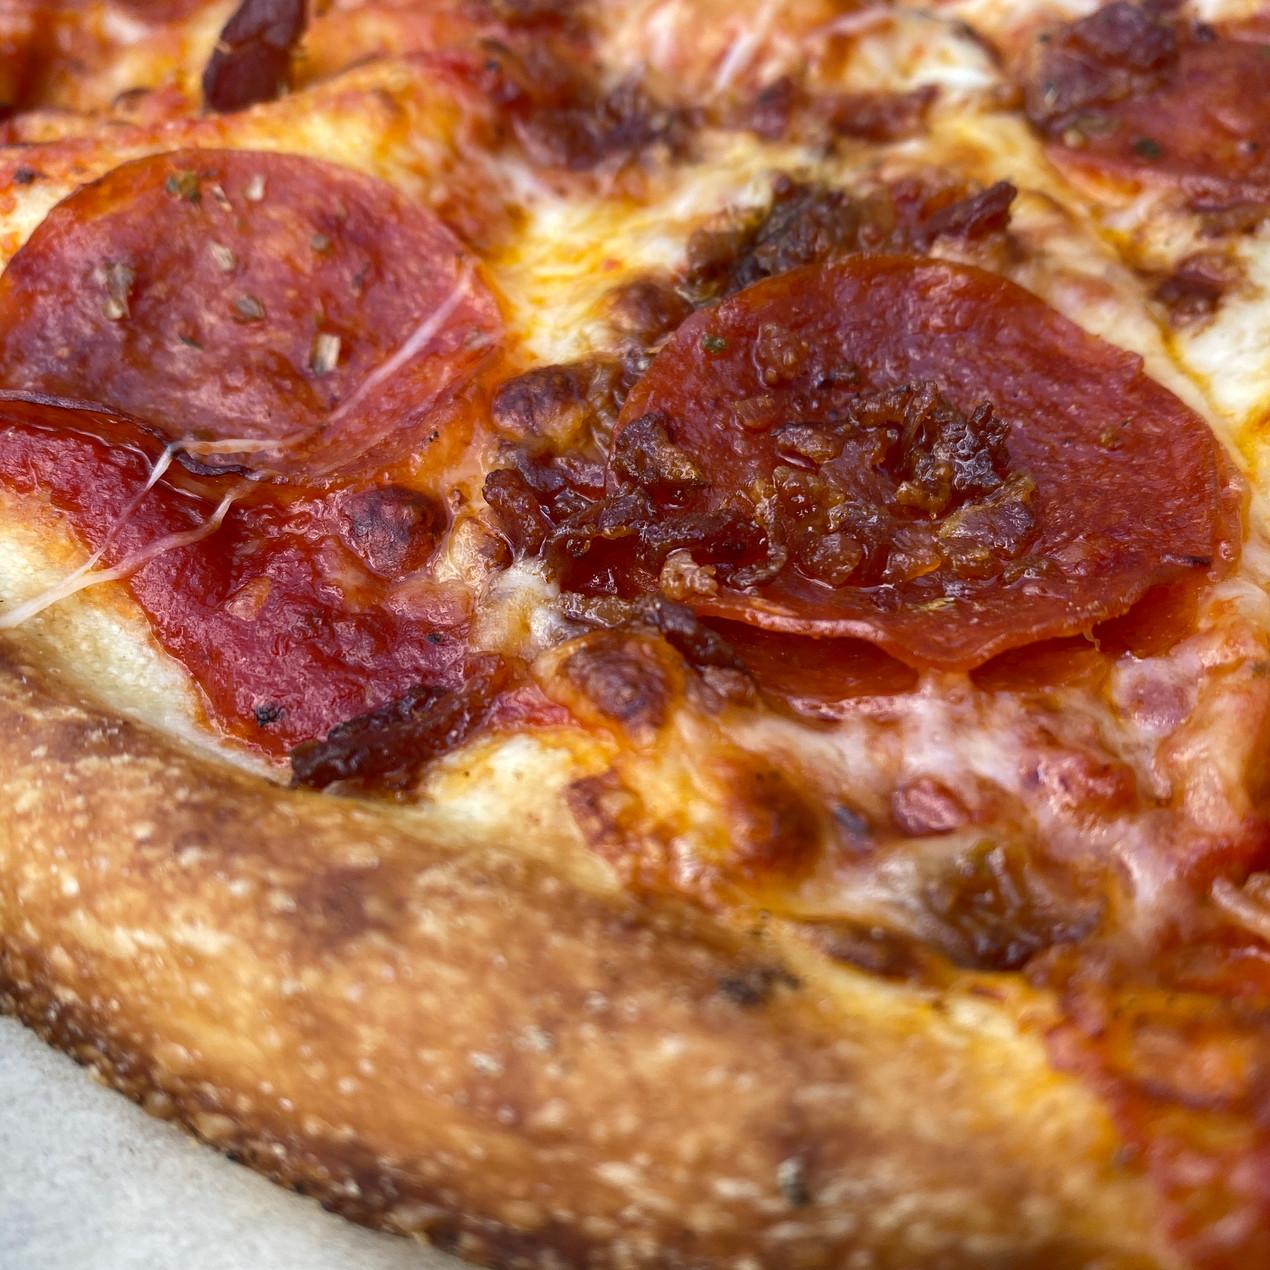 blaze pizza pepperoni detail photo close up